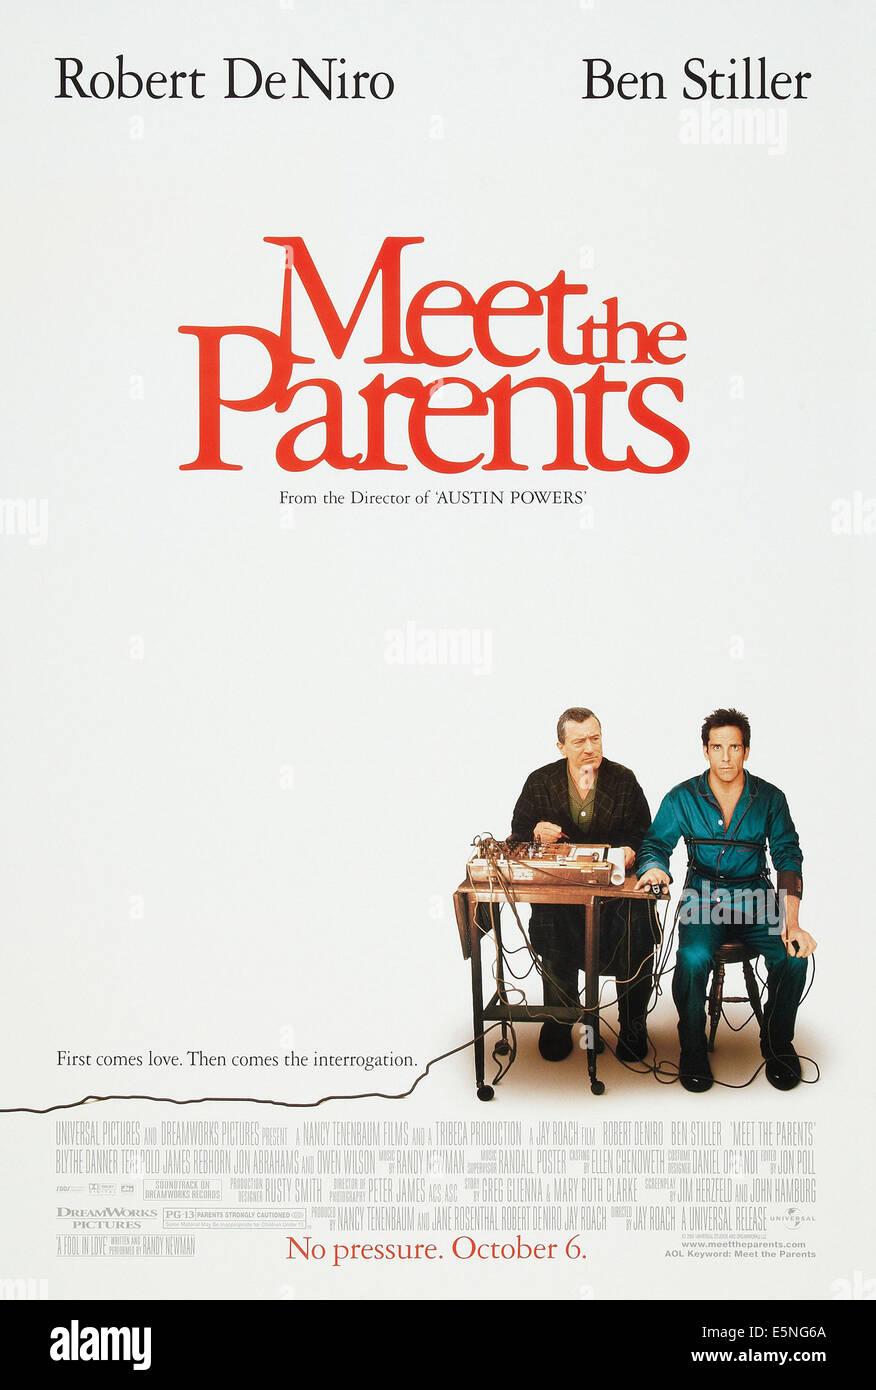 MEET THE PARENTS, US advance poster art, from left: Robert De Niro, Ben Stiller, 2000. © Universal Pictures/ - Stock Image